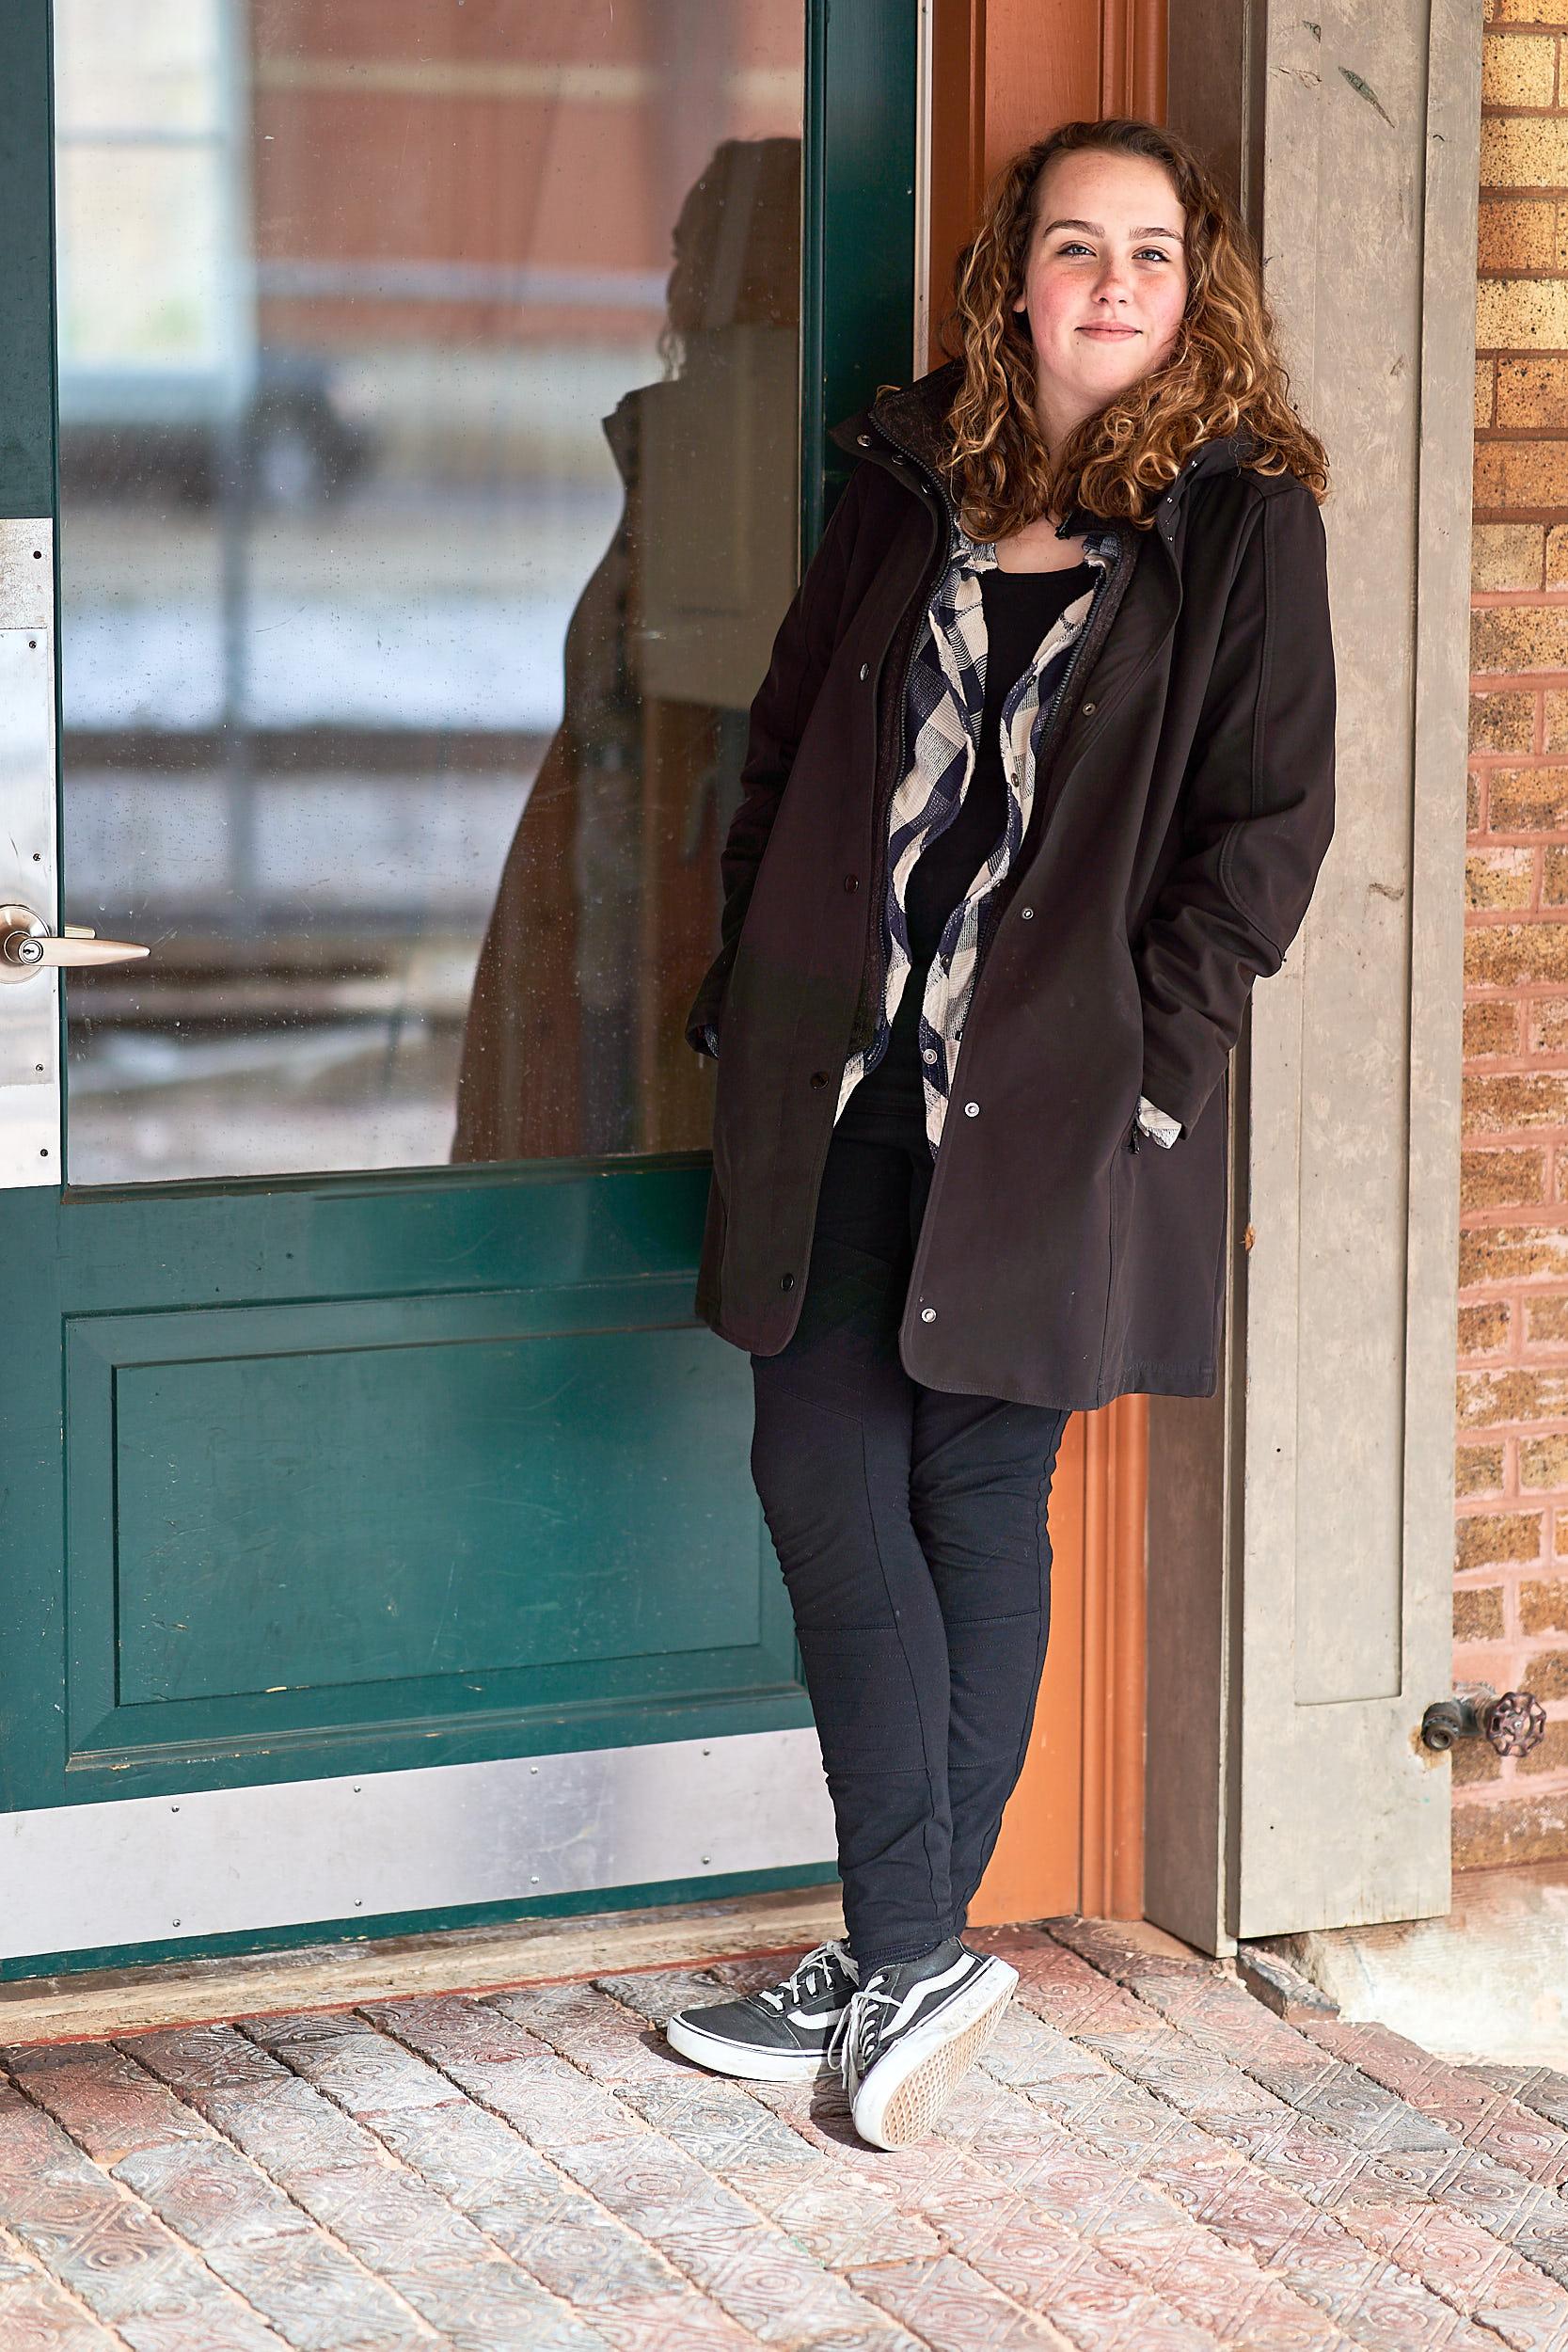 Teenage Girl Doorway Portrait | Photo By BillyBengtson.com